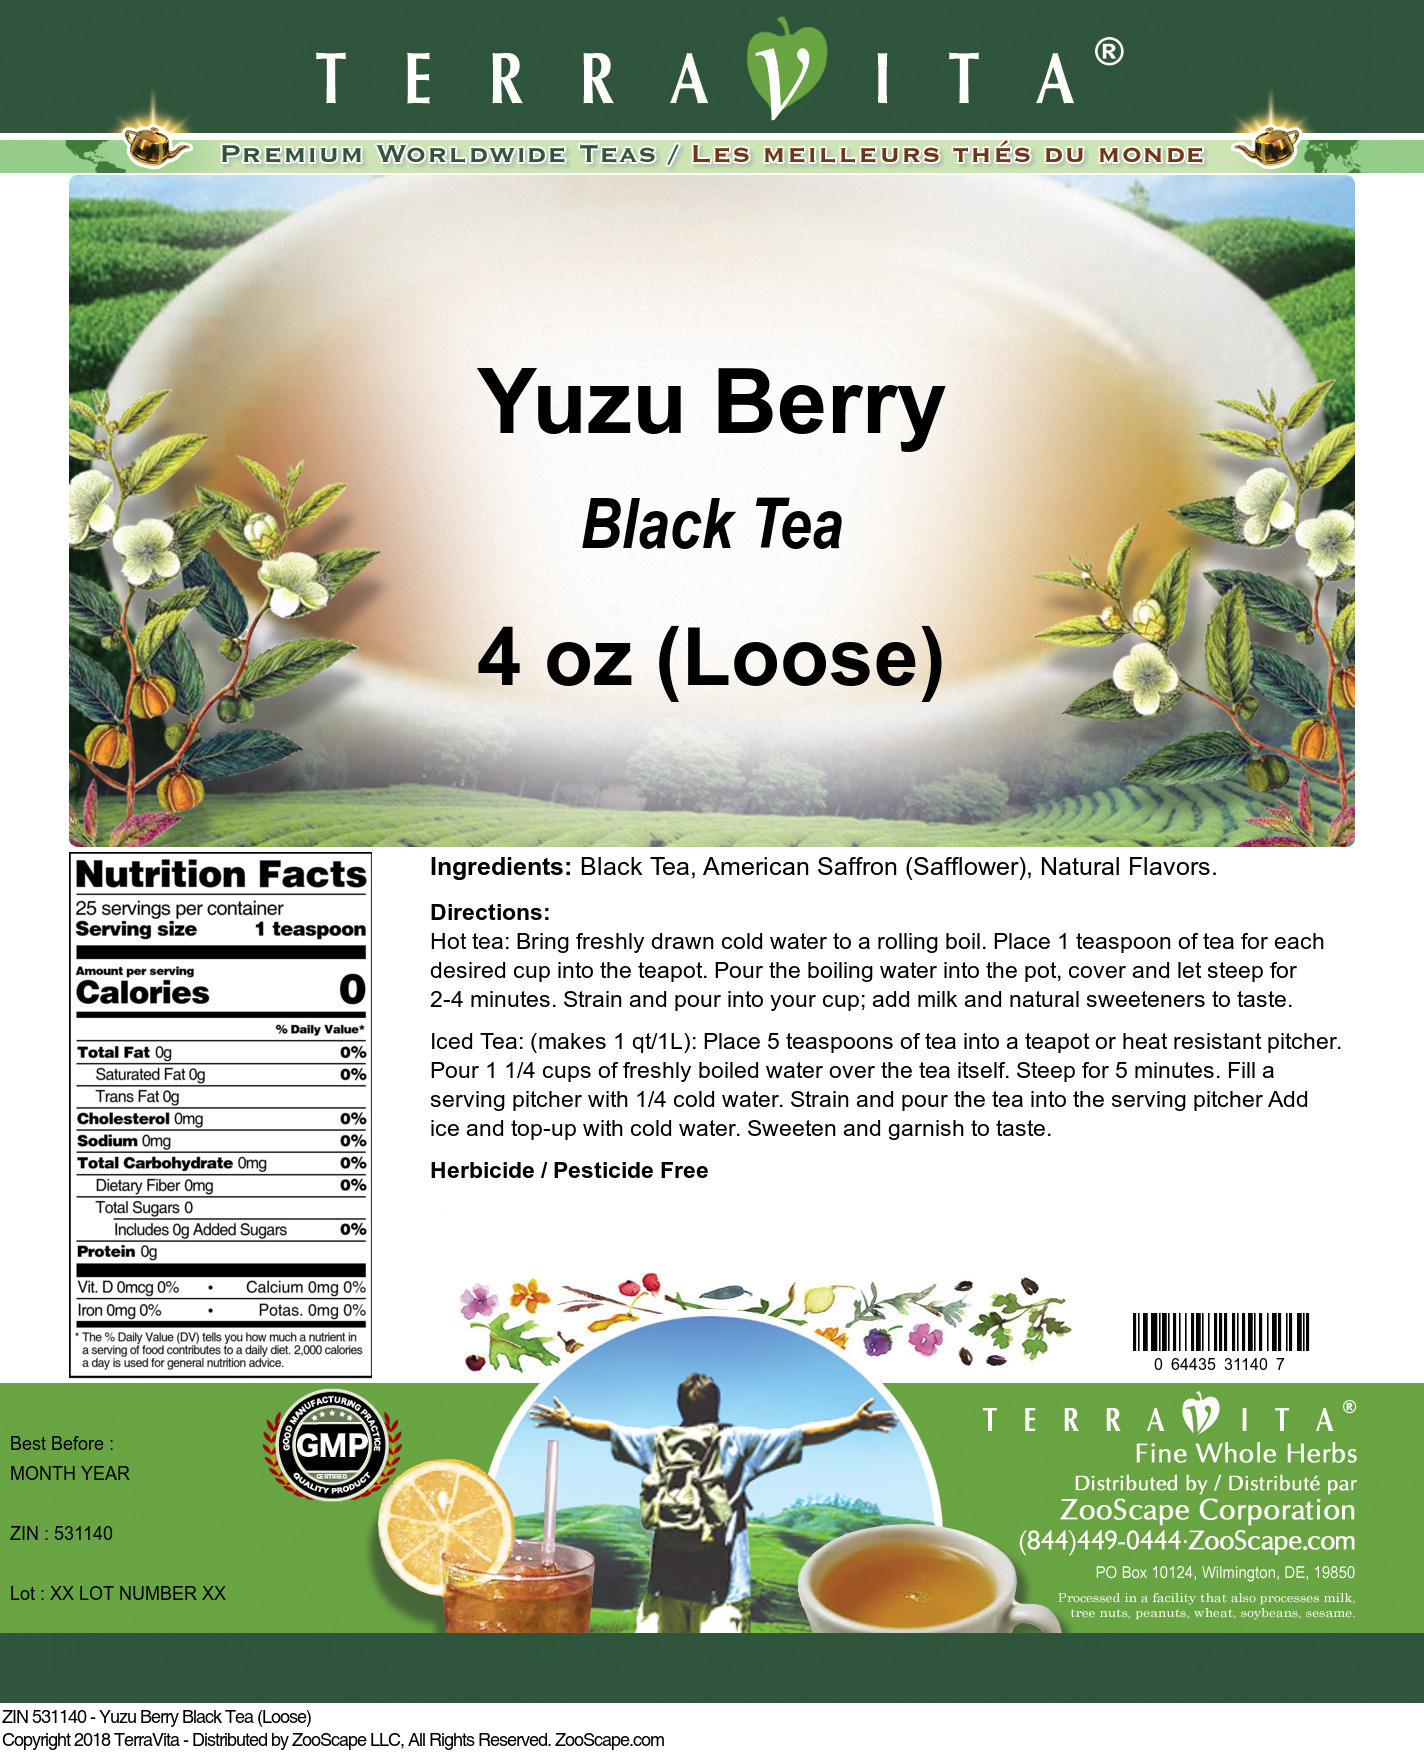 Yuzu Berry Black Tea (Loose)